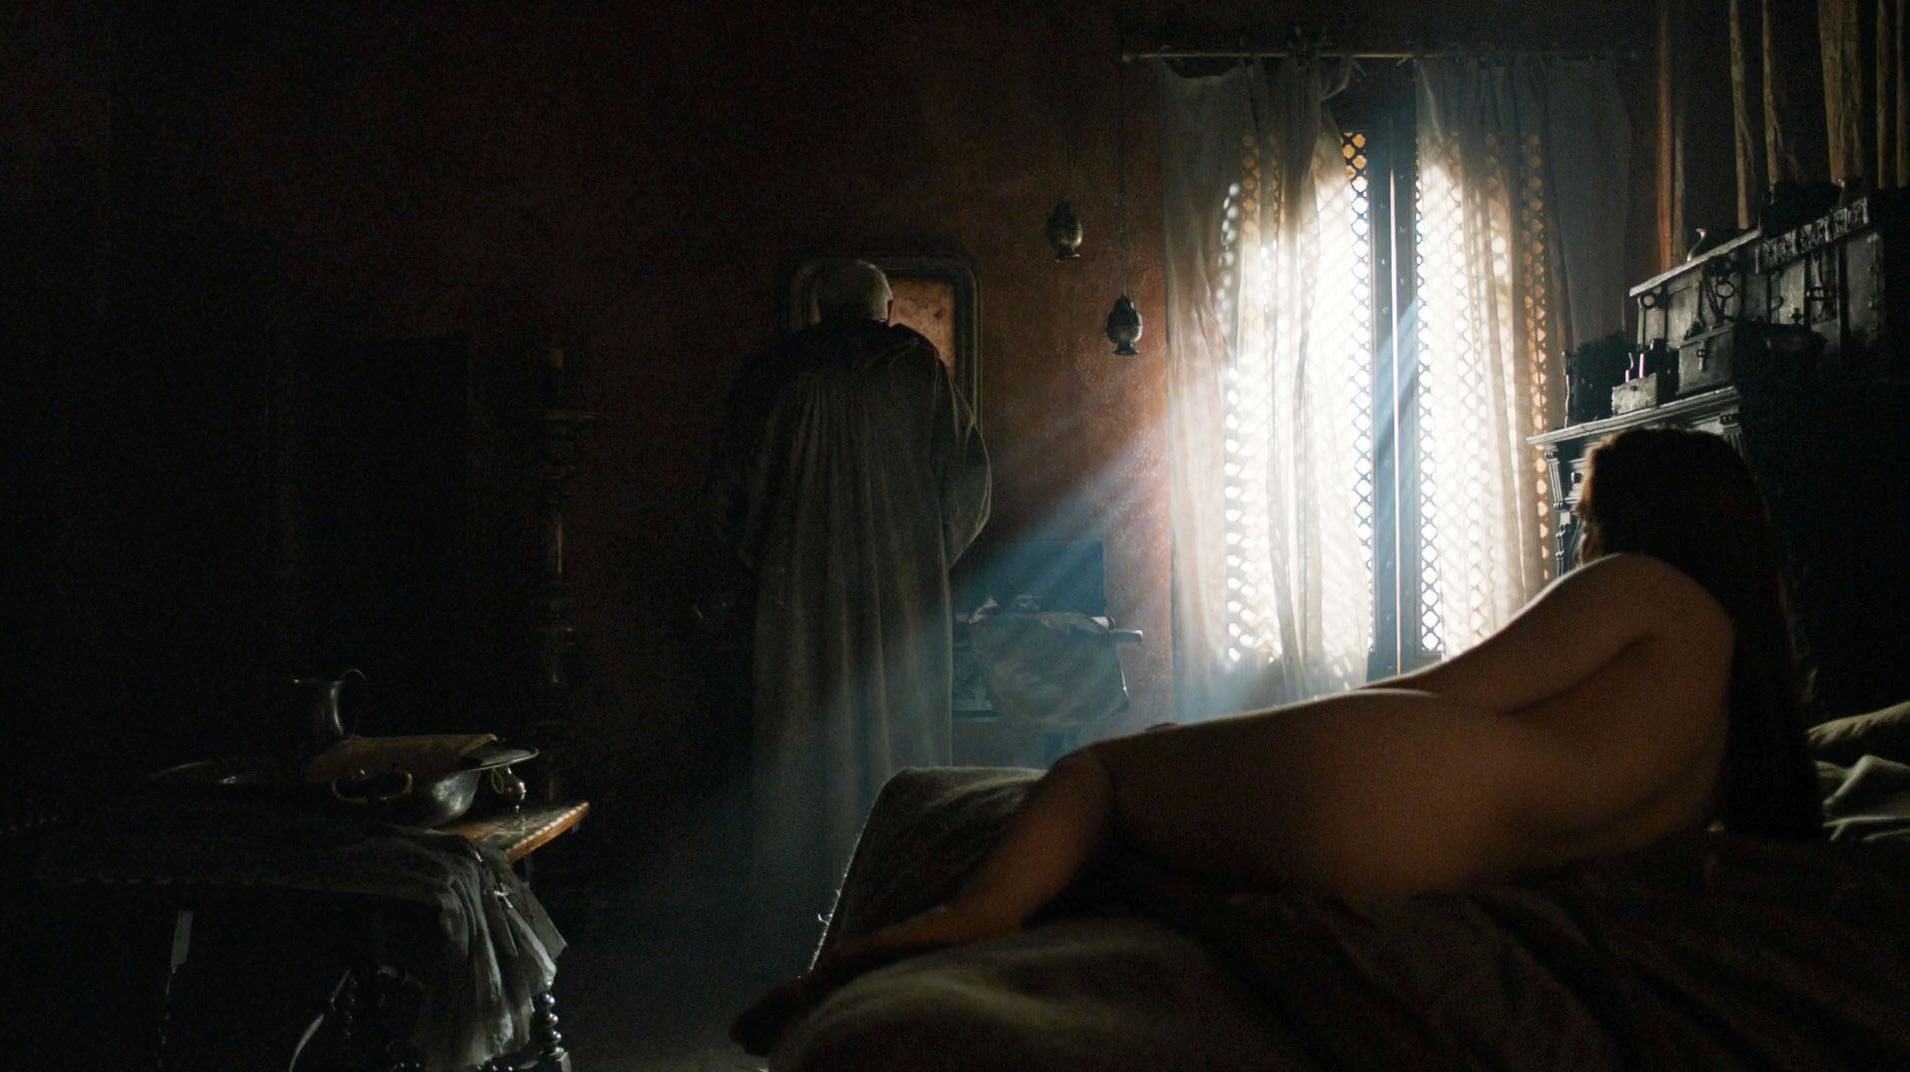 Josephine Gillan nude - Game of Thrones s06e10 (2016)